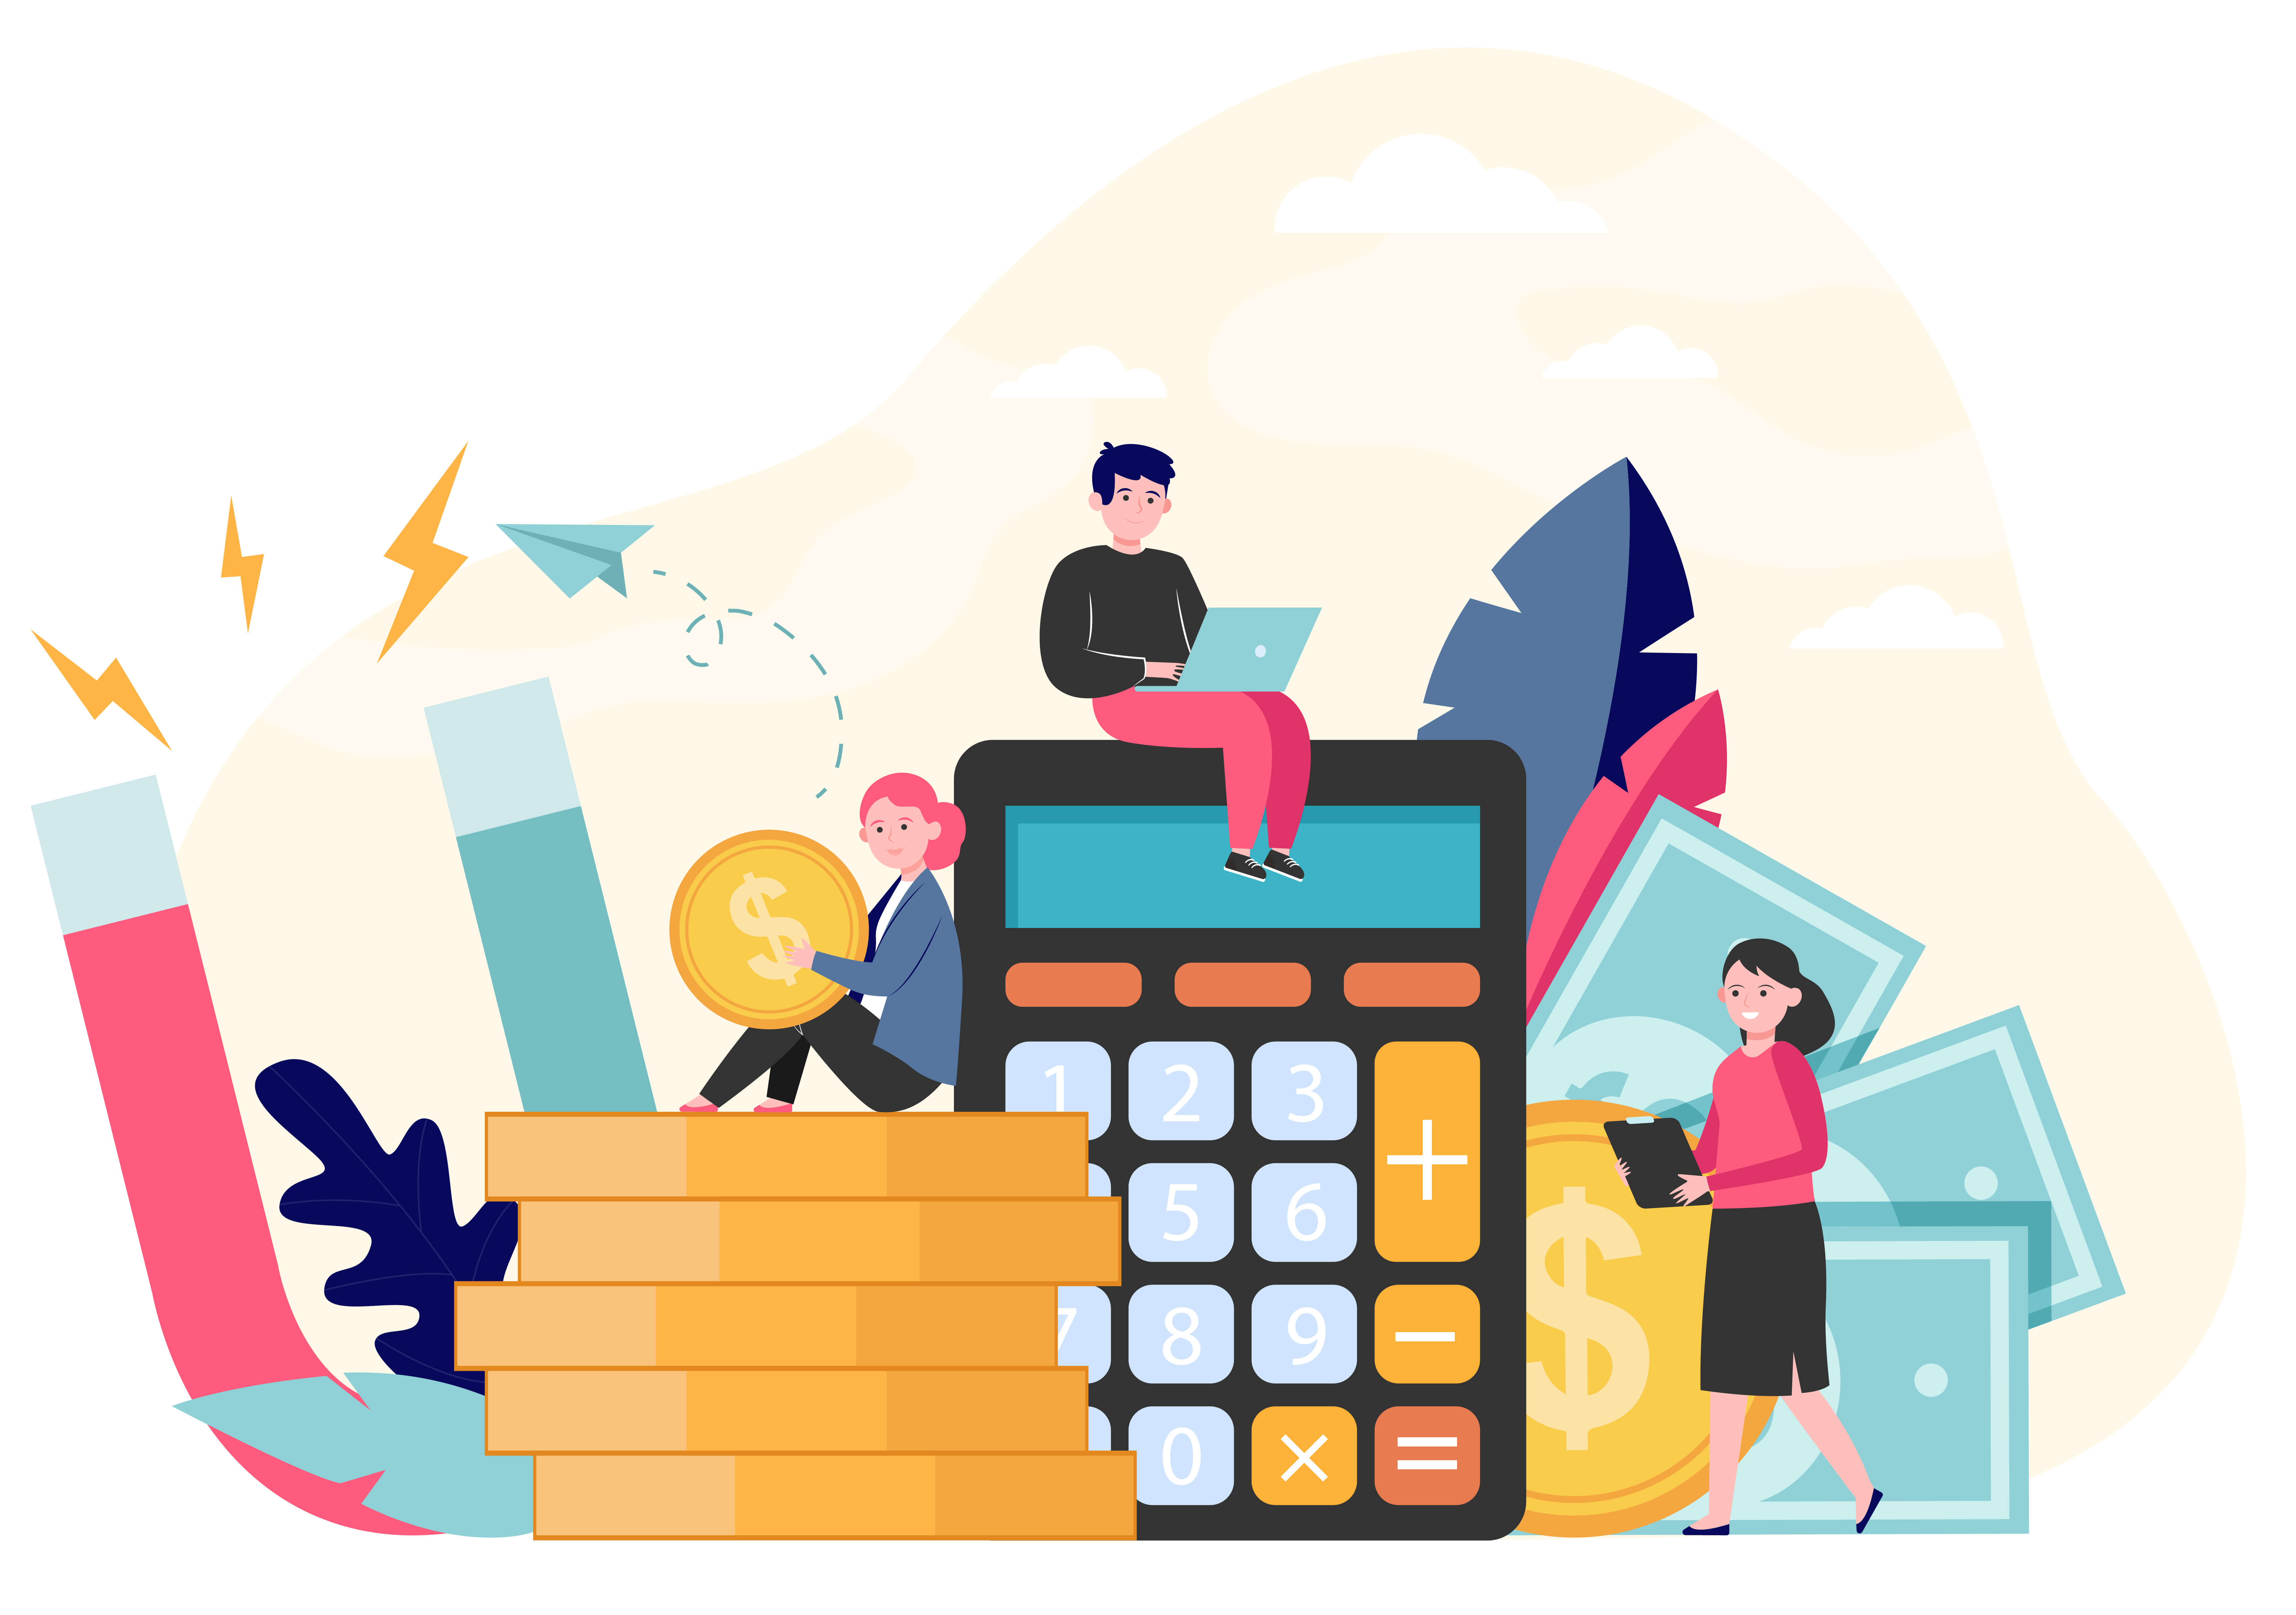 How to Login and Deposit Money in Binarium